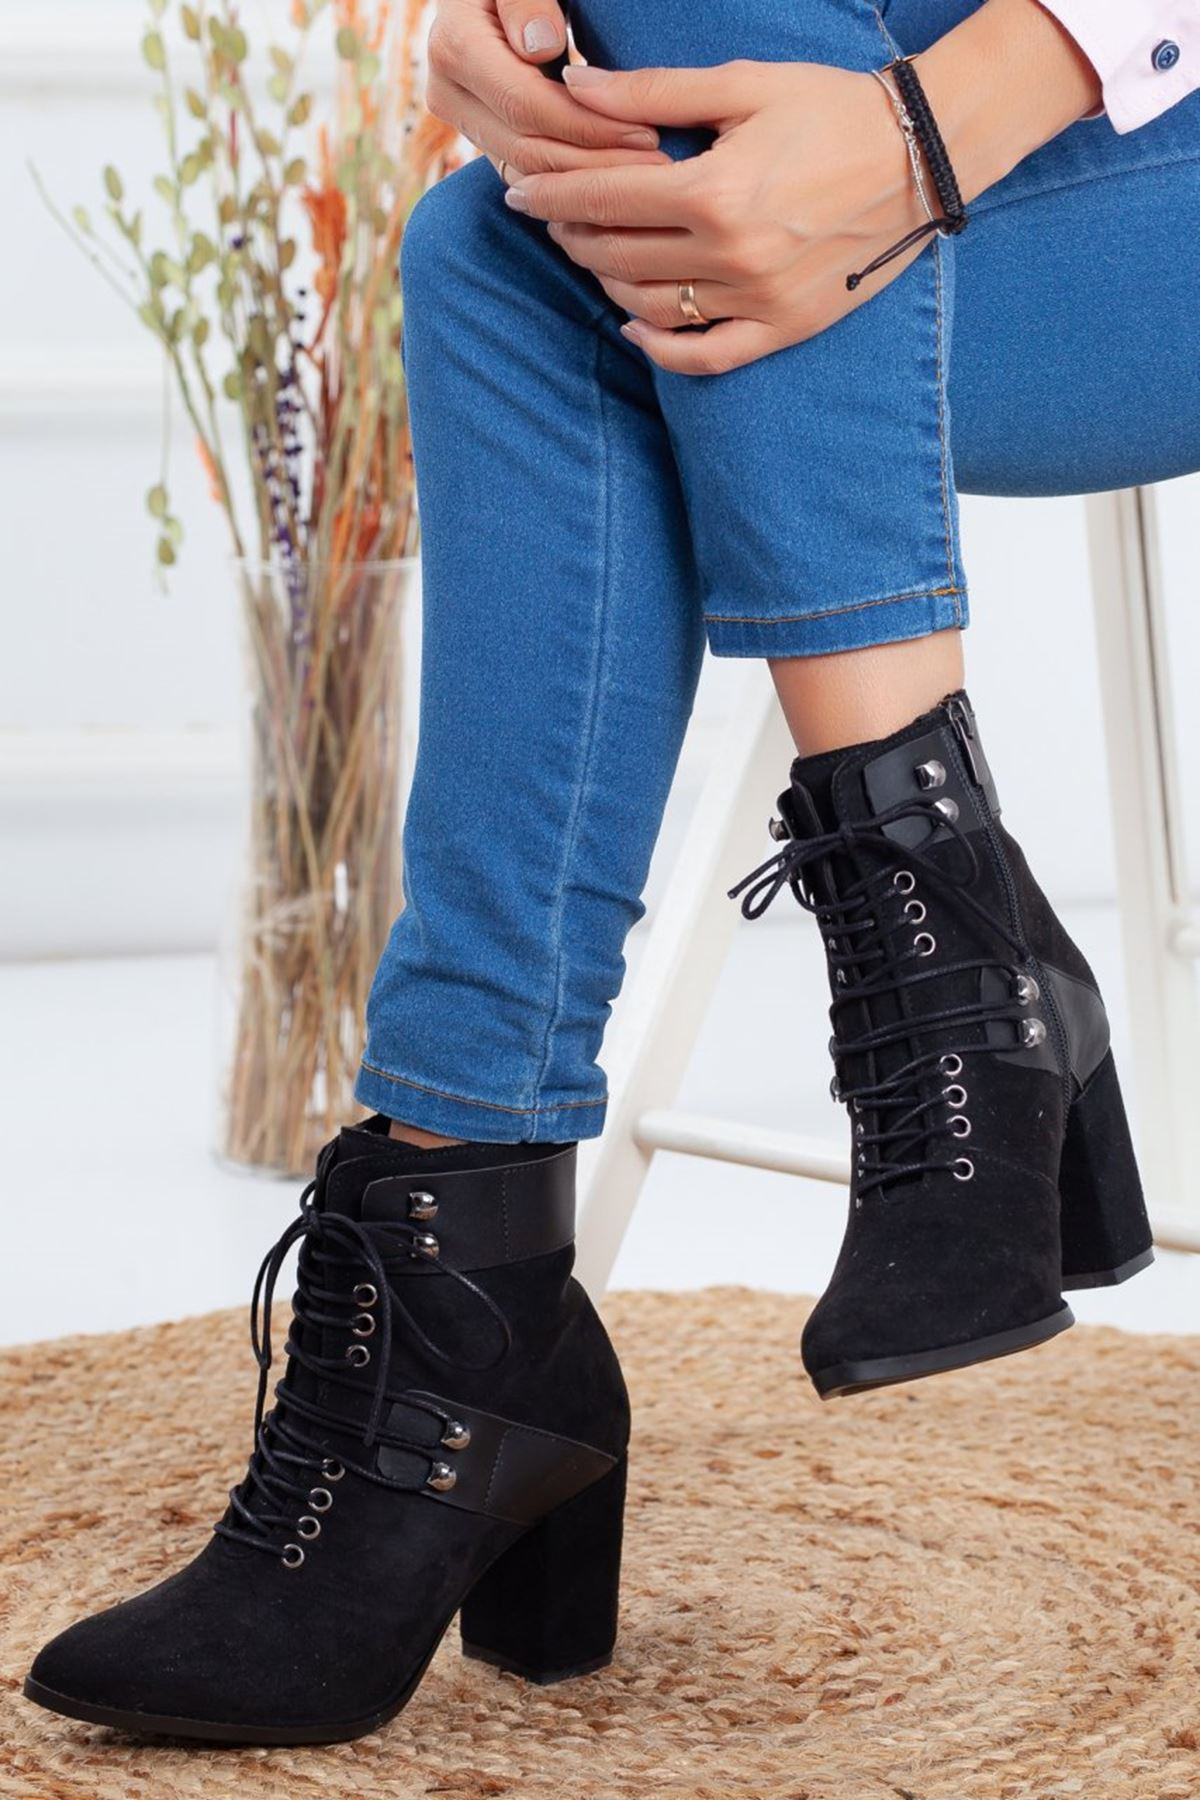 Kadın Mogli Topuklu Bağcıklı Siyah Süet Bot